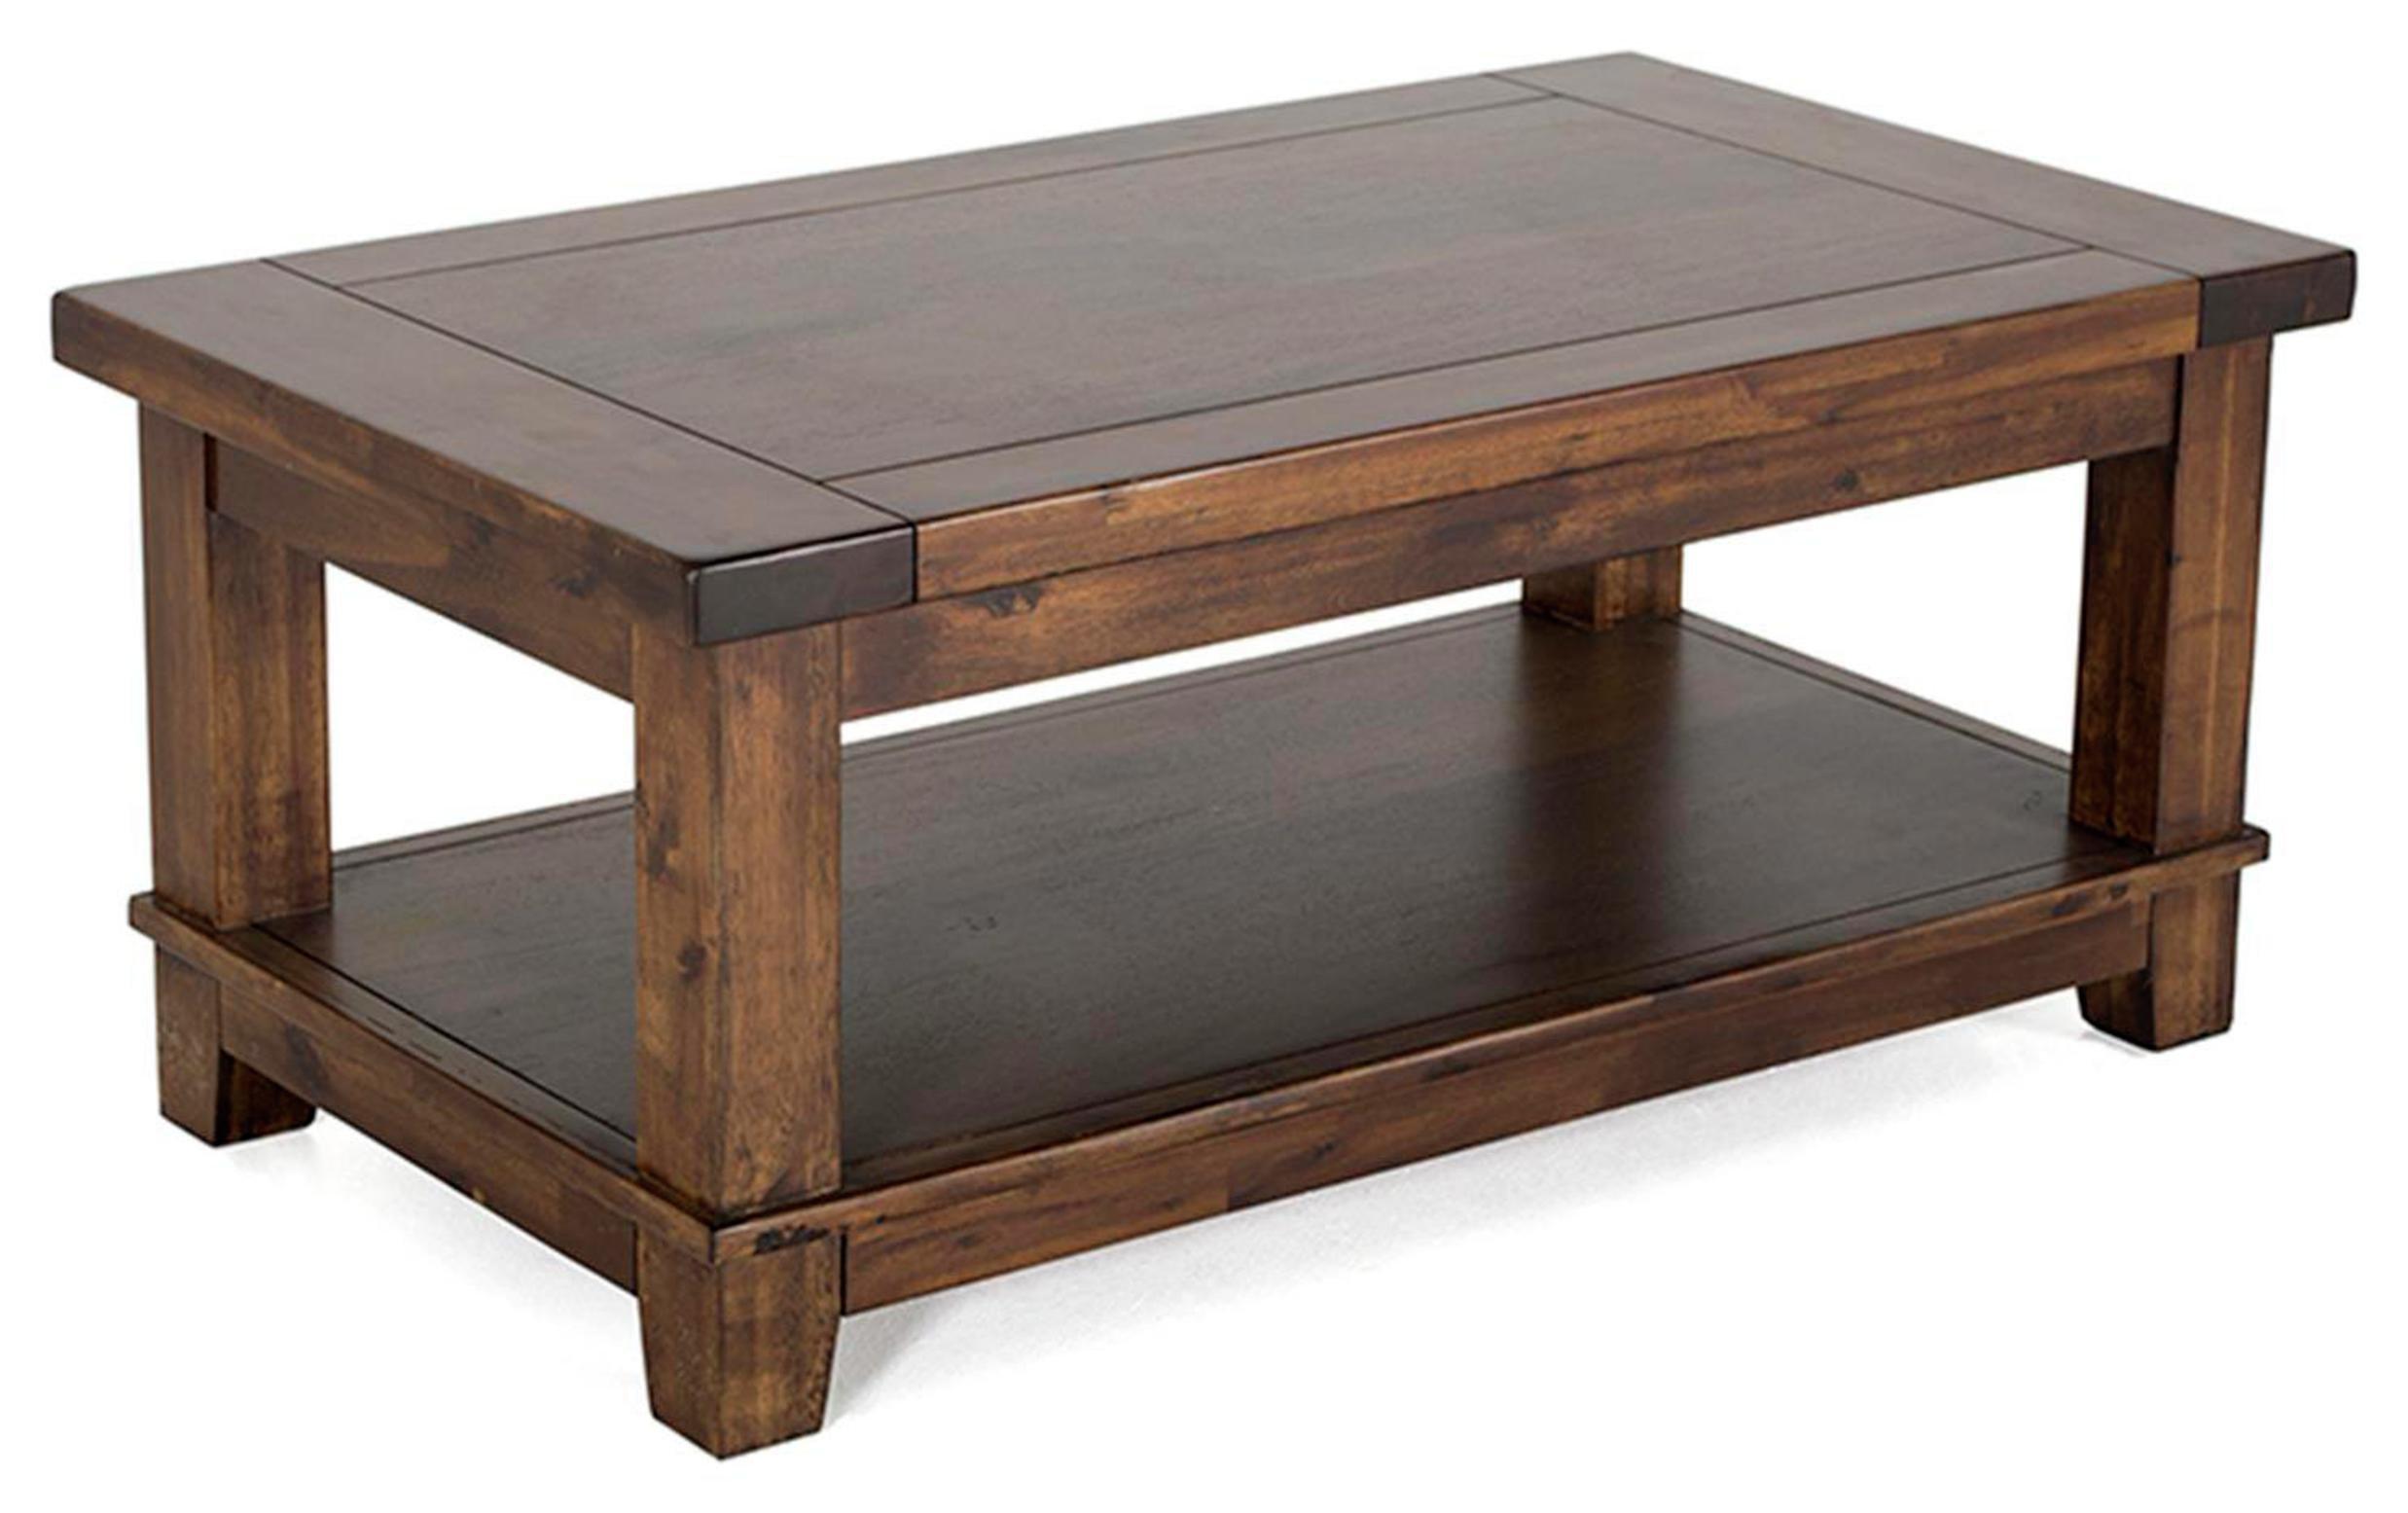 Image of Furnoko Emerson Solid Wood Coffee Table - Walnut